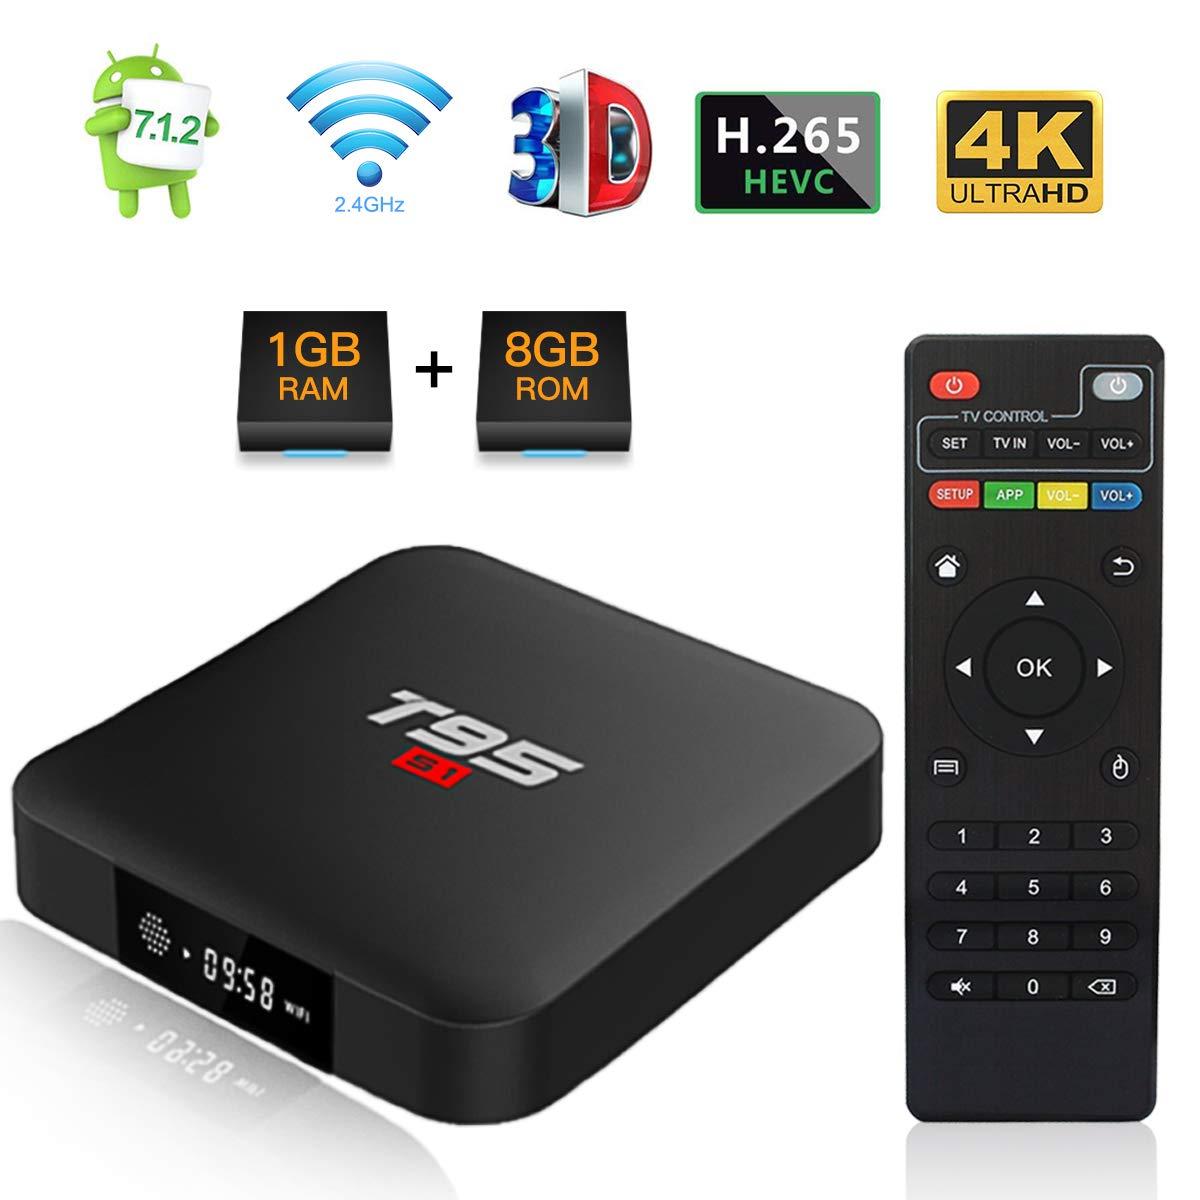 Smart Internet TV Box - Digital Advertising Media - (Digital Signage,  Billboards and Menu Boards)